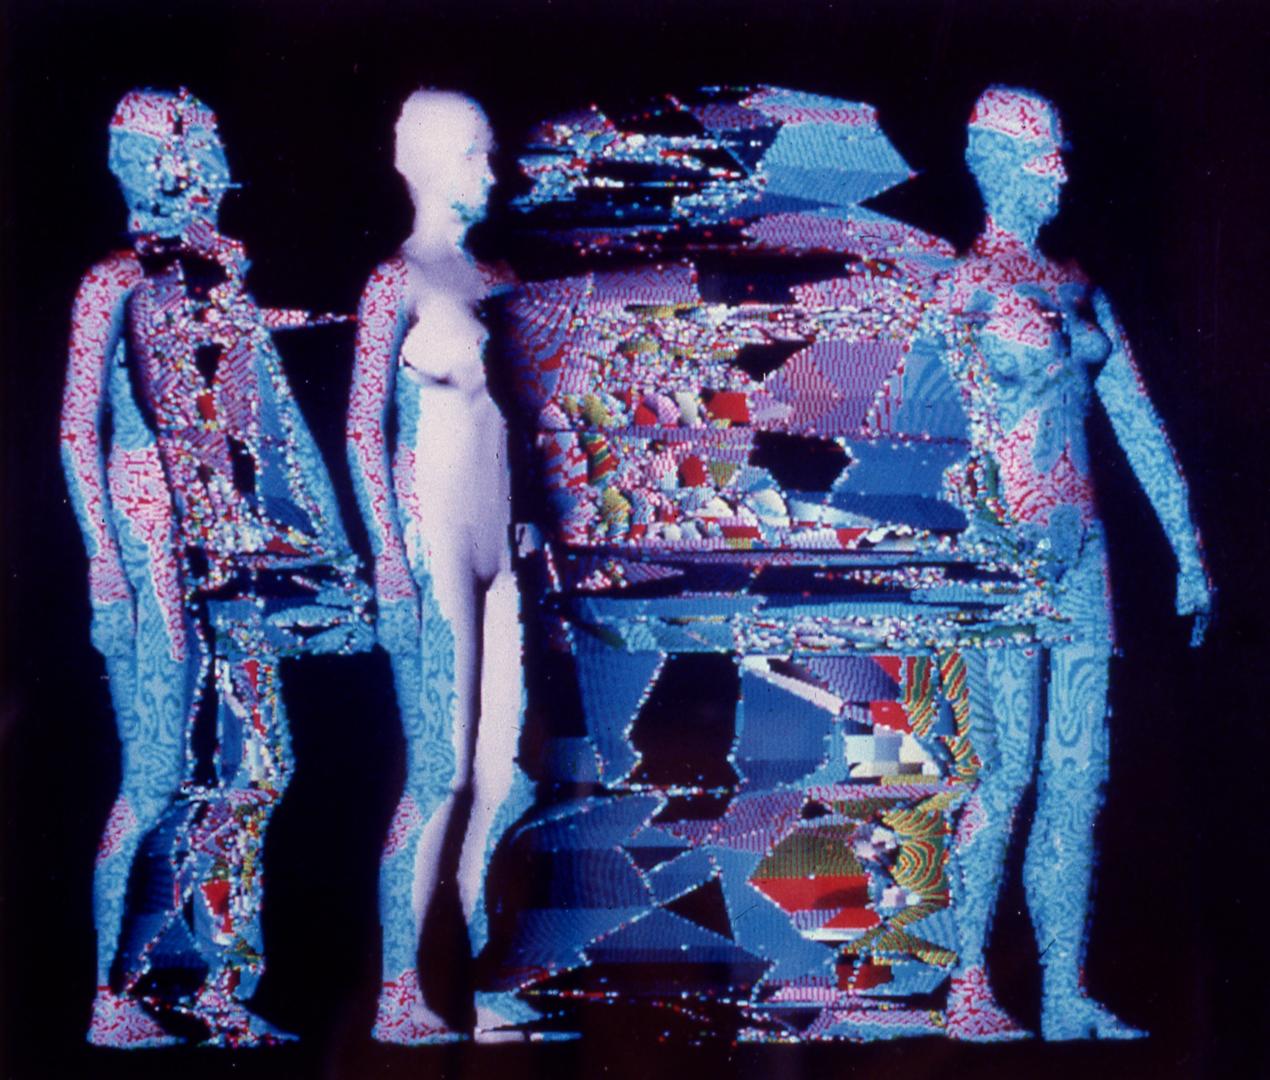 ©1981, Duane M. Palyka, #22 Picasso 2